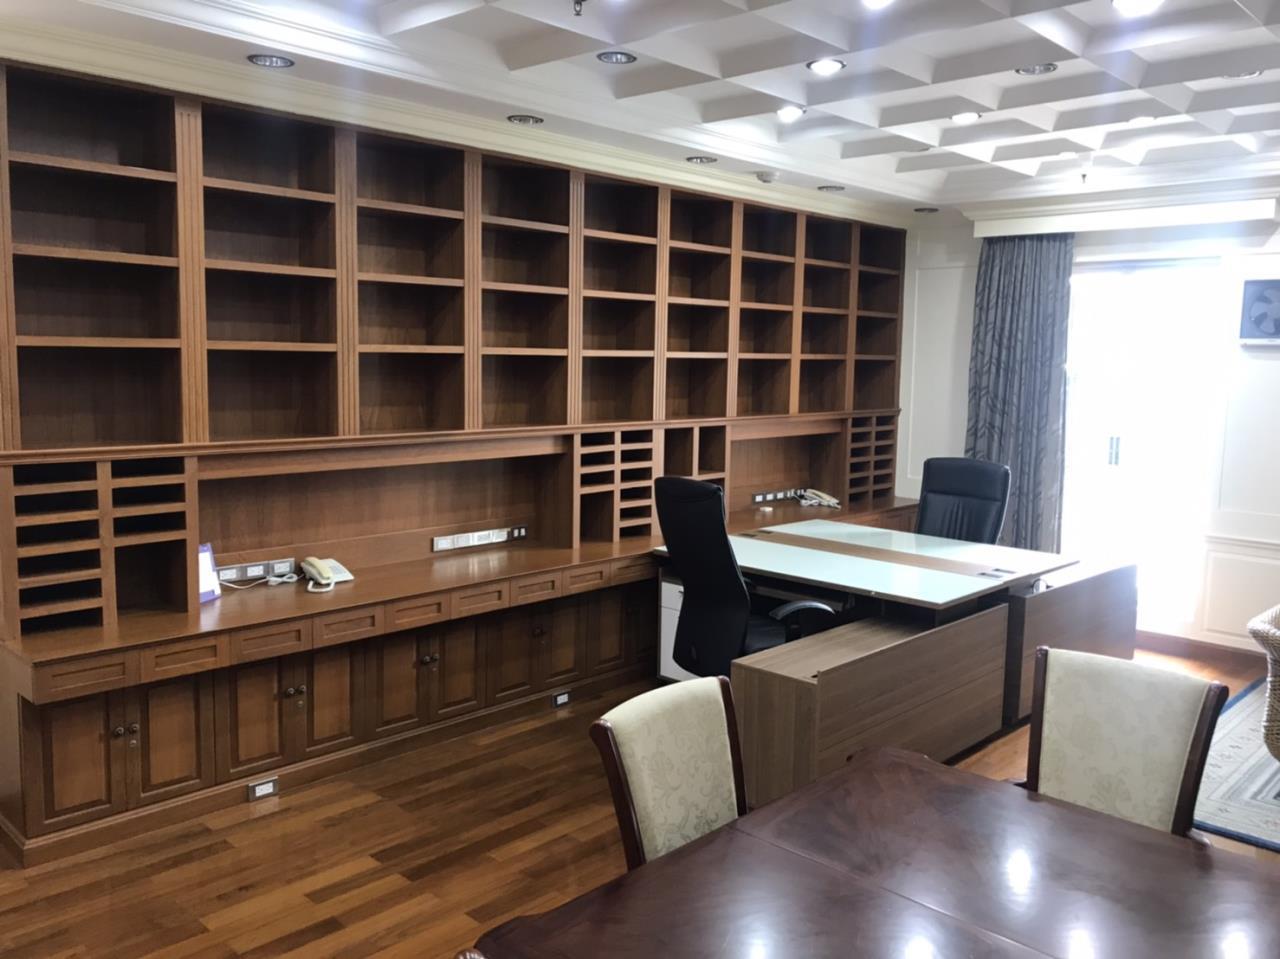 Blueocean property Agency's Condo For Rent – Condo Citismart Sukhumvit 18 6